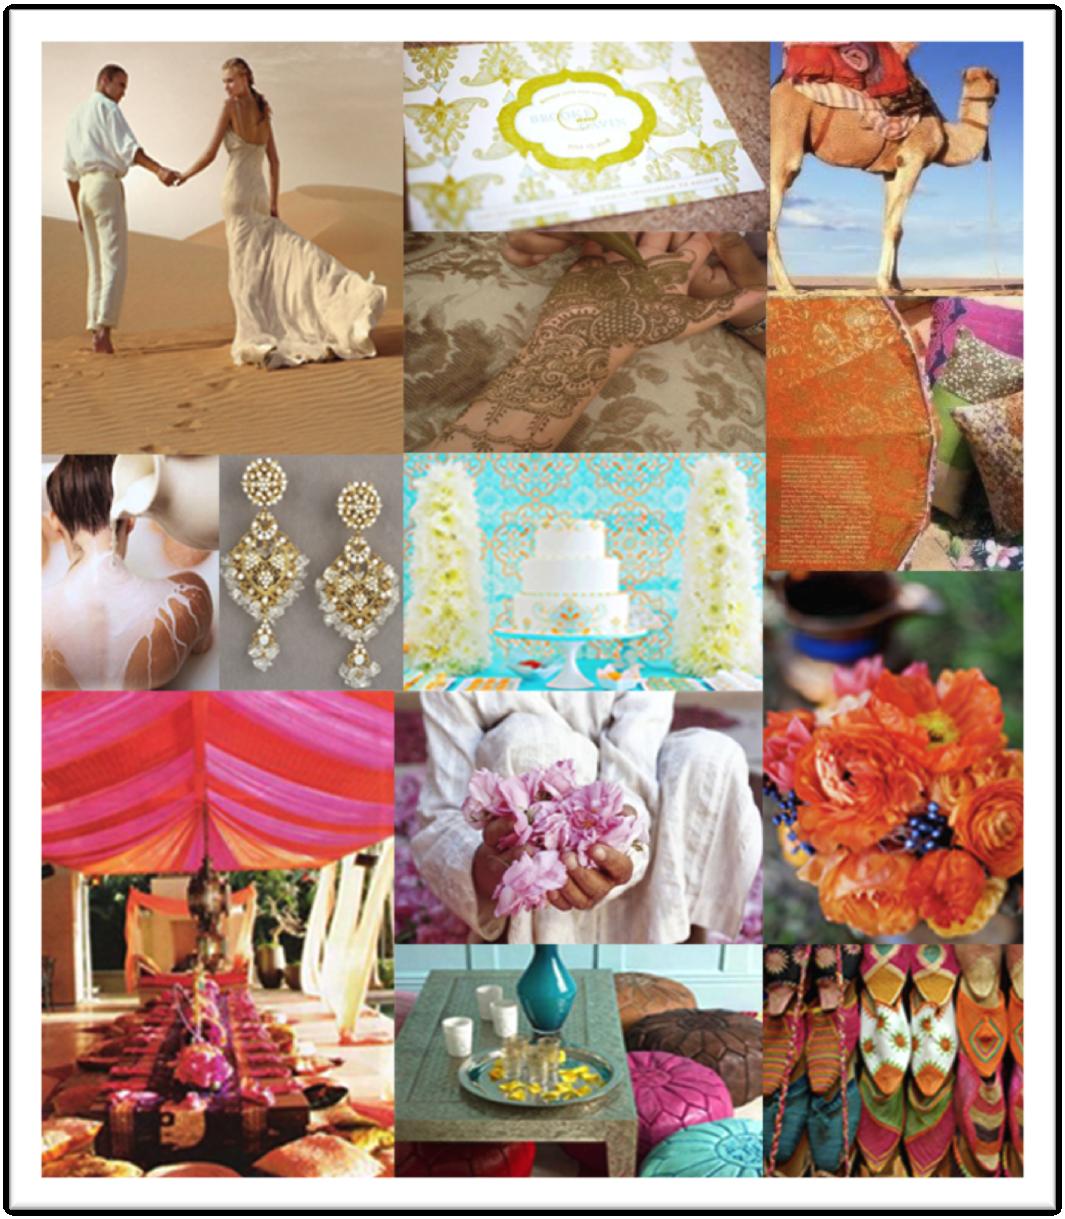 Decoraci n marroqu bodas d - Decoracion marruecos ...